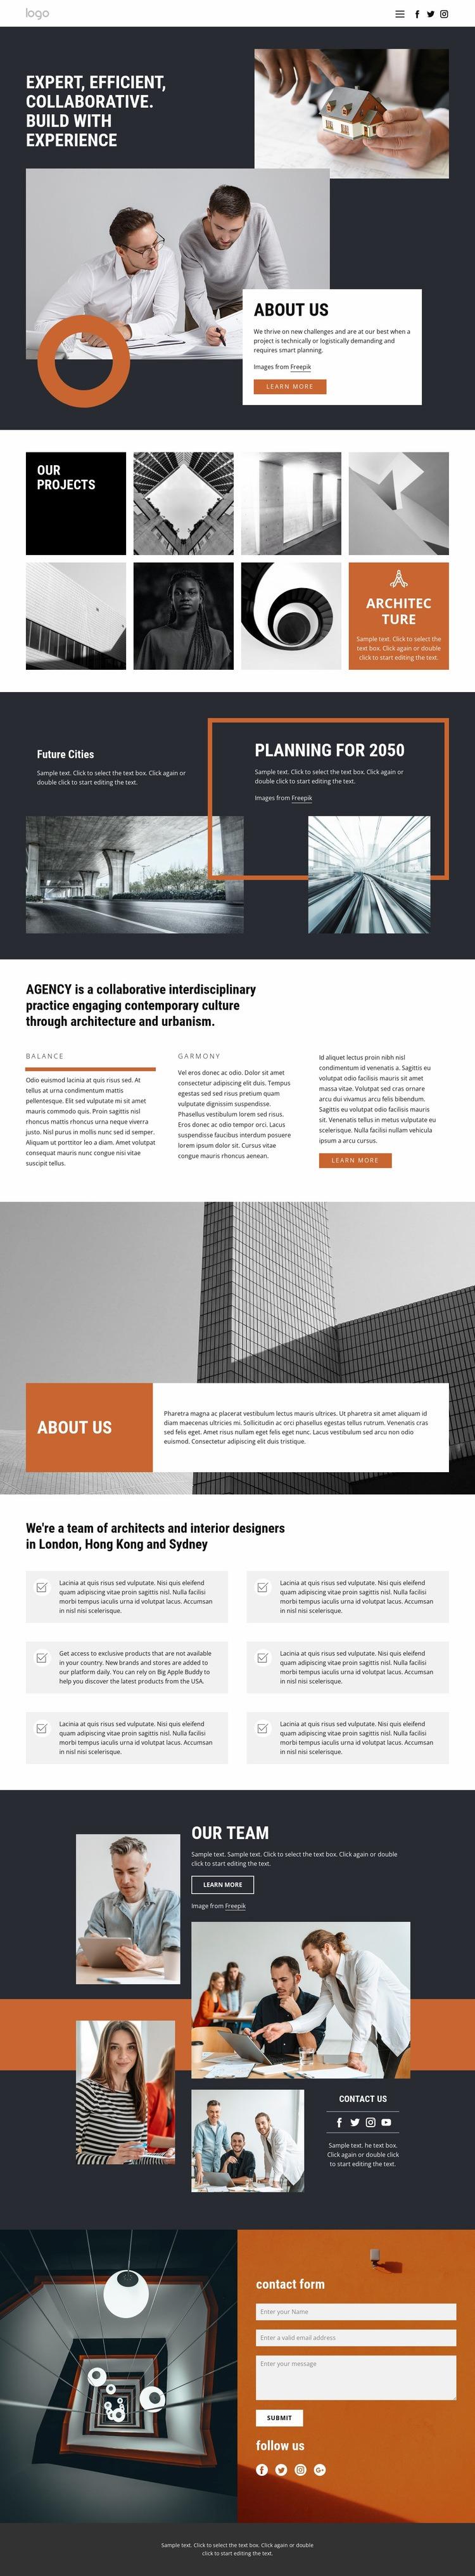 Architects design group Web Page Designer